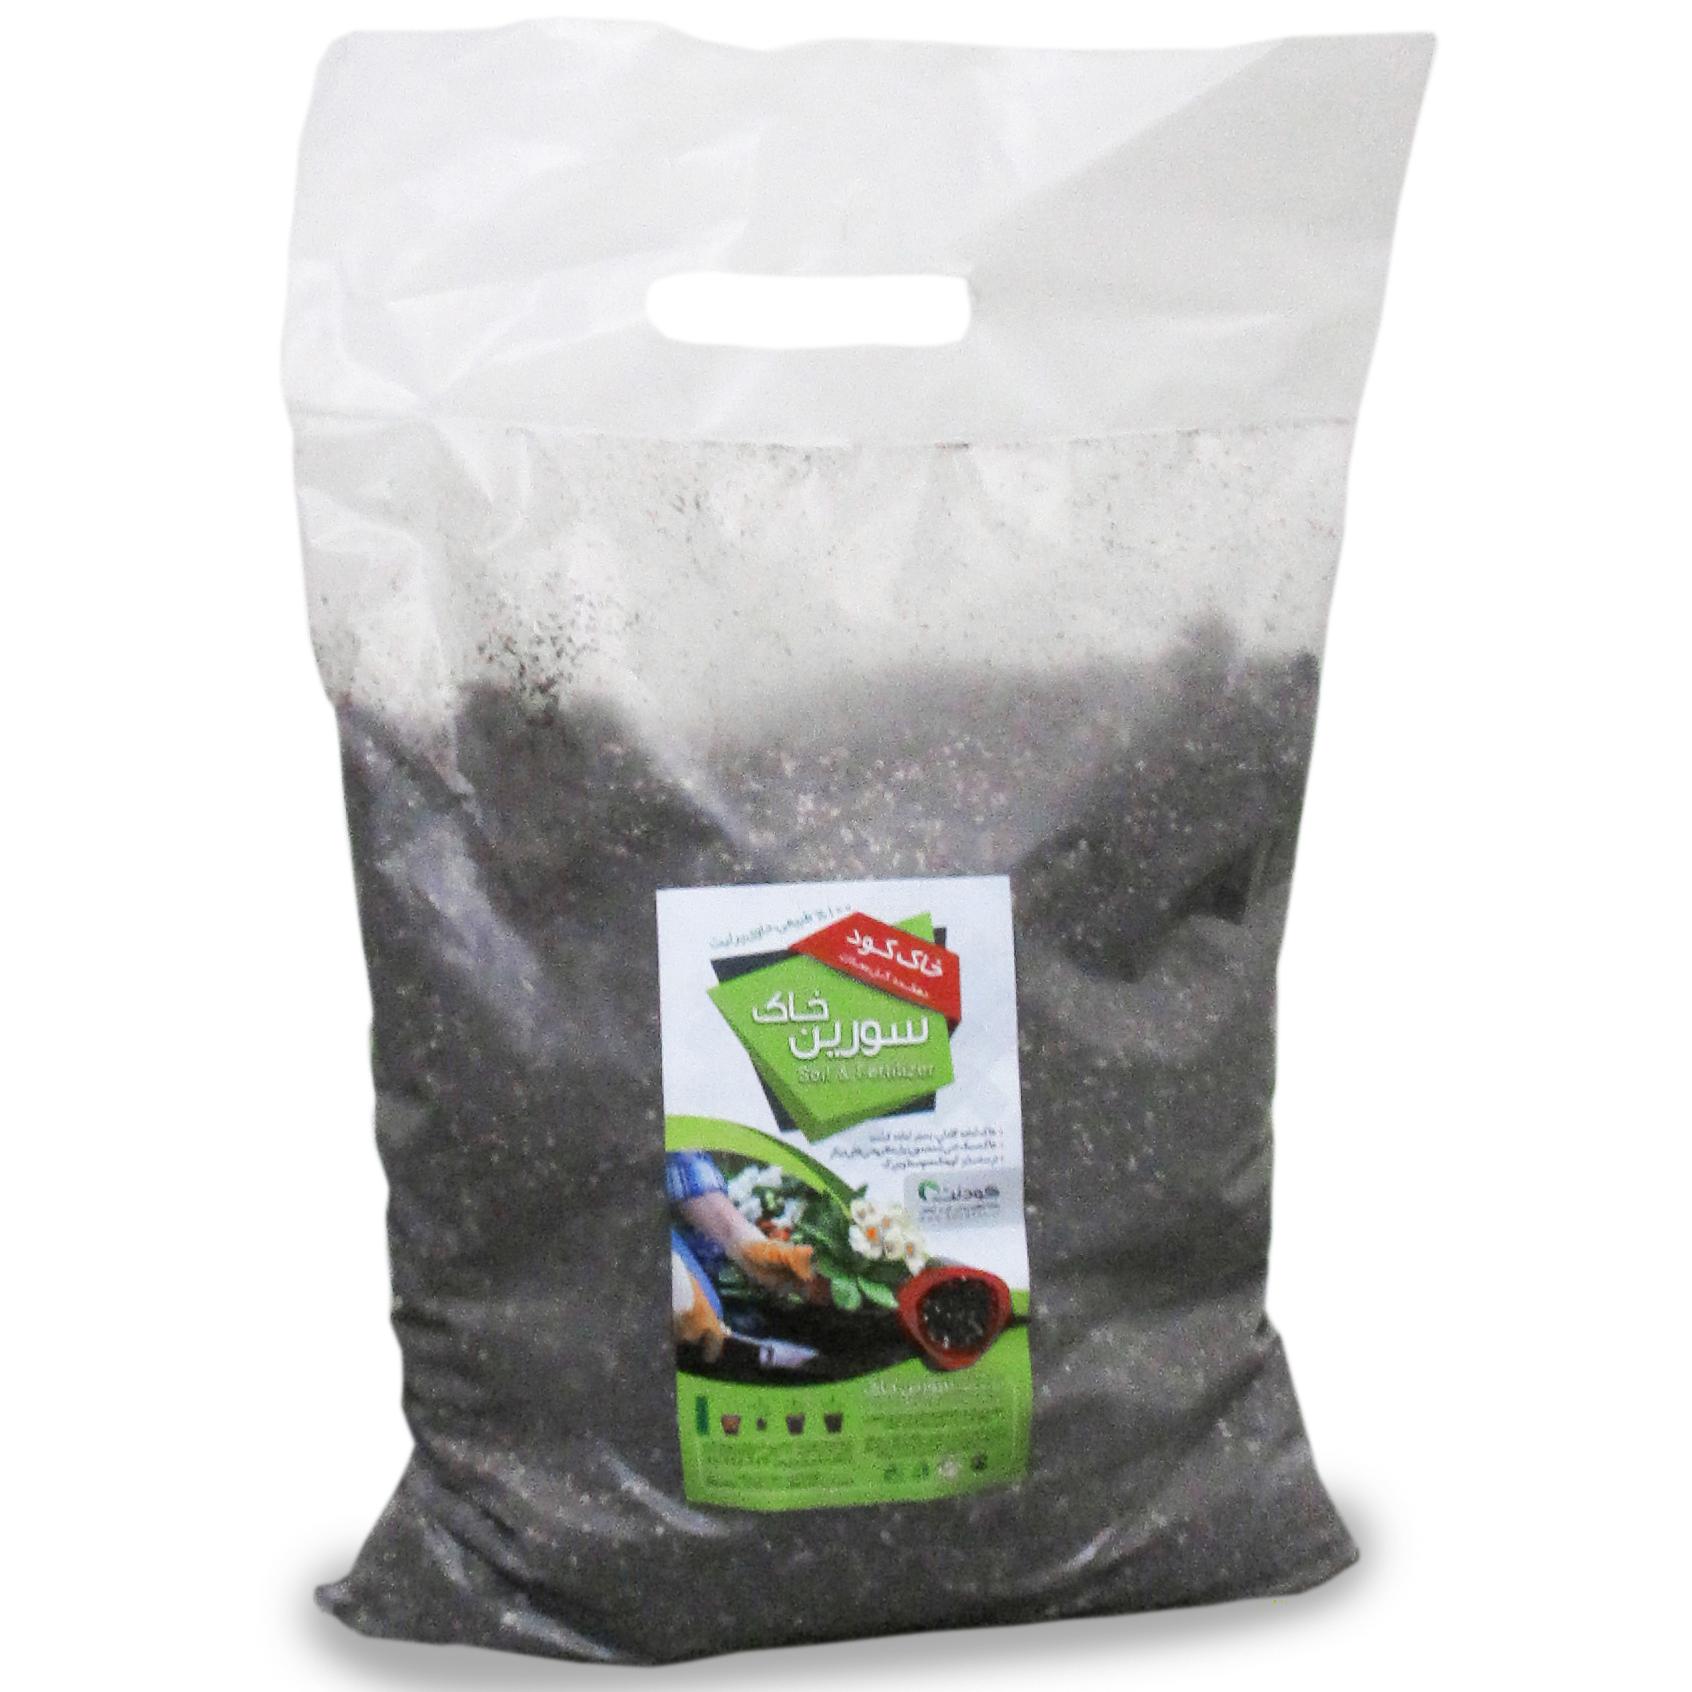 خاک کود سورین خاک سایز بزرگ (10 لیتری)